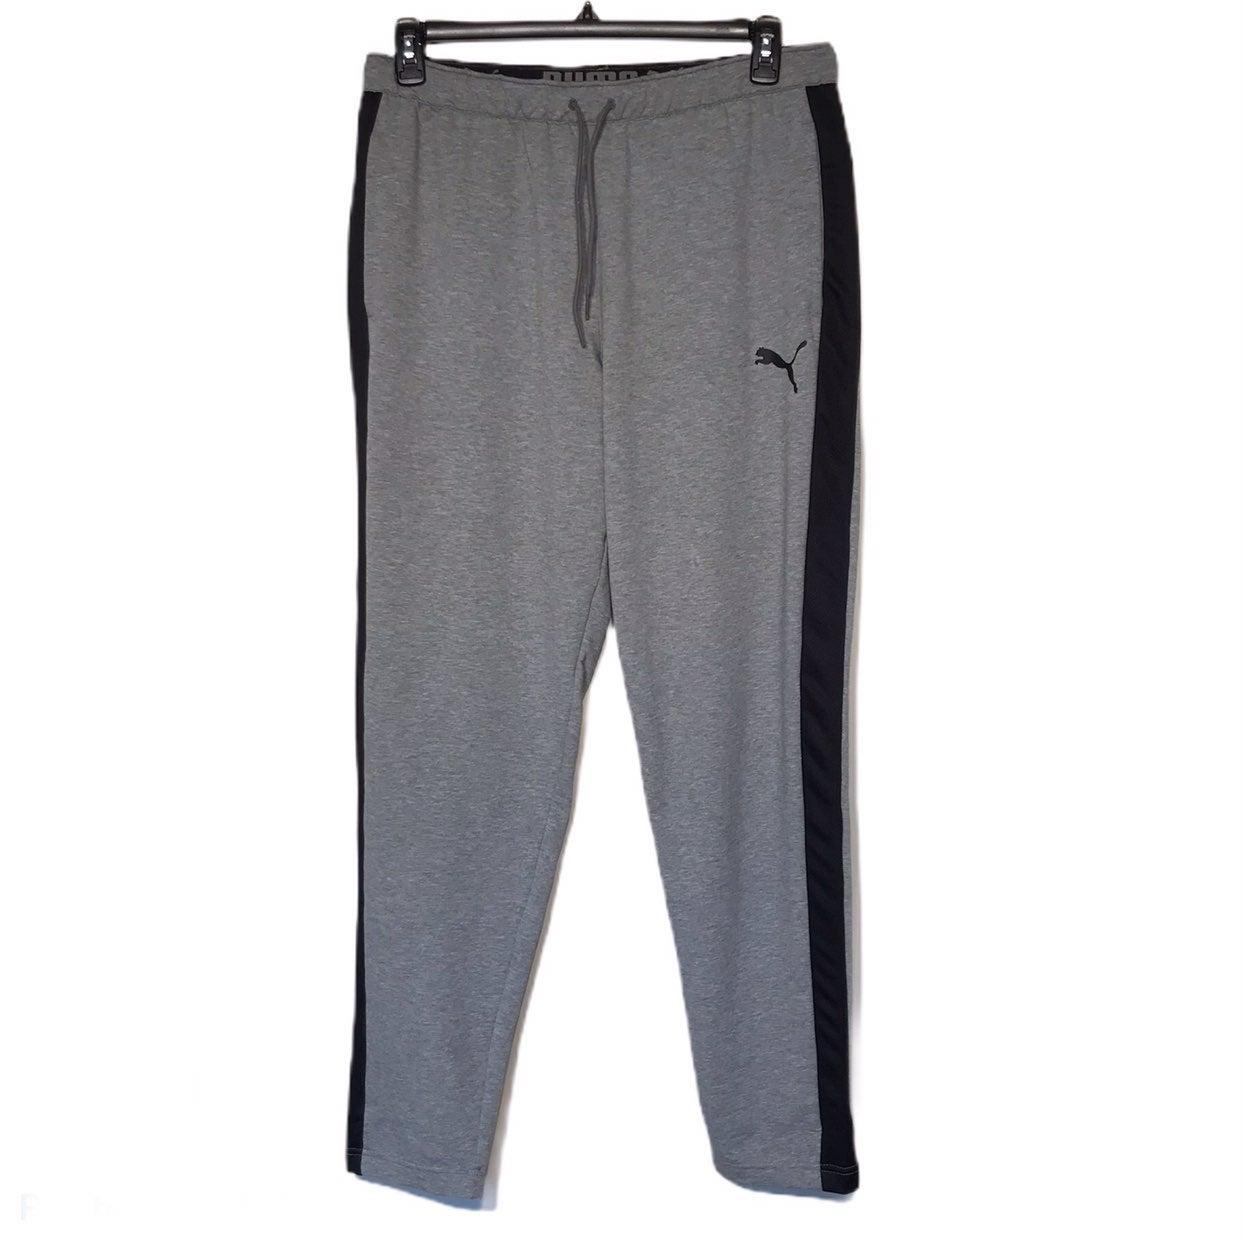 Puma Stretchlite Gray Sweatpants